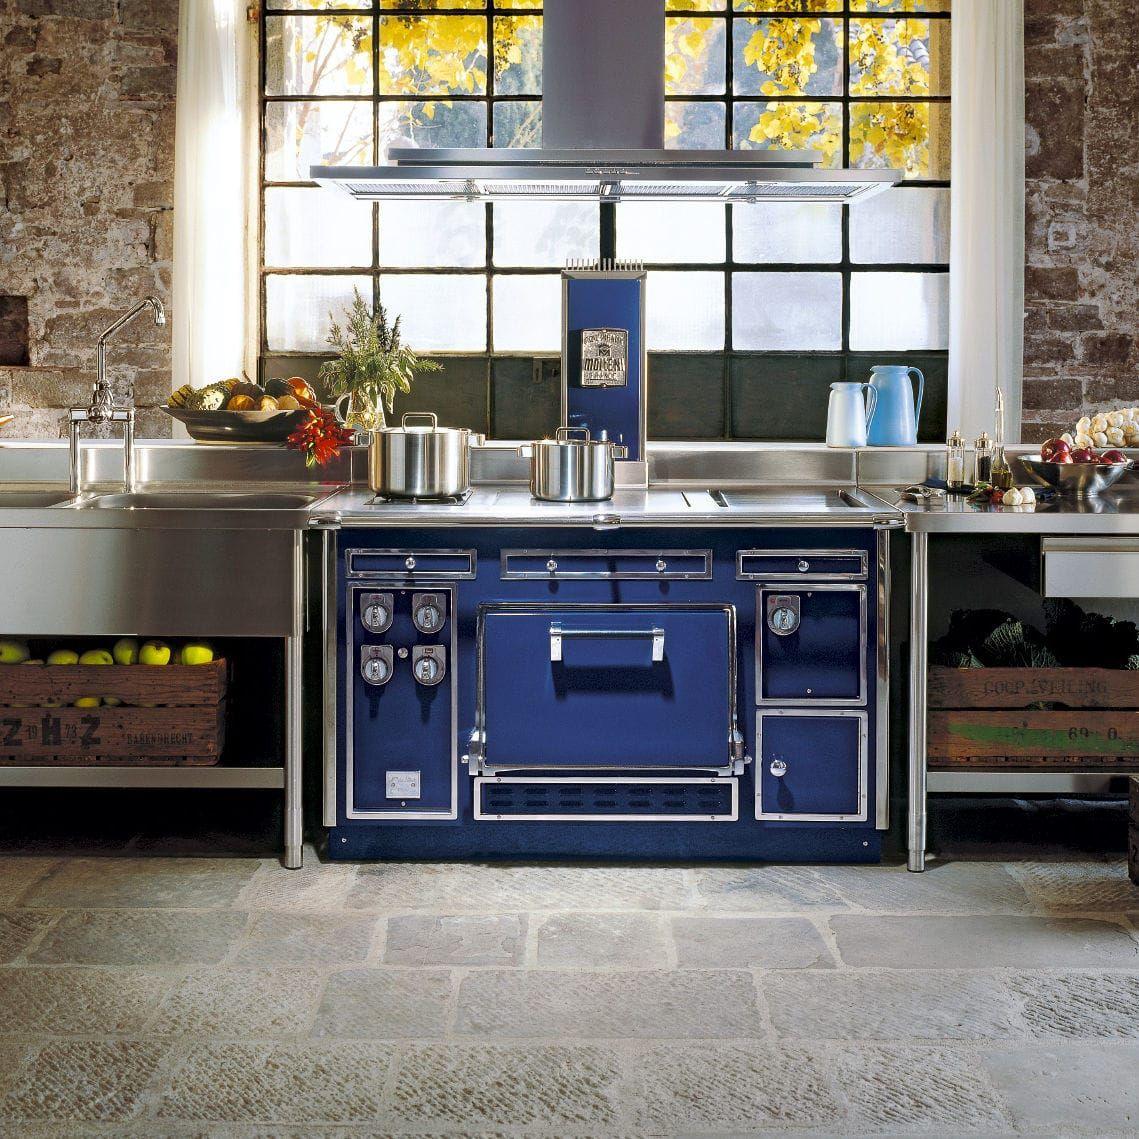 Cuisiniere A Bois La Cornue pinedwin michell on kitchens | modern kitchen stoves